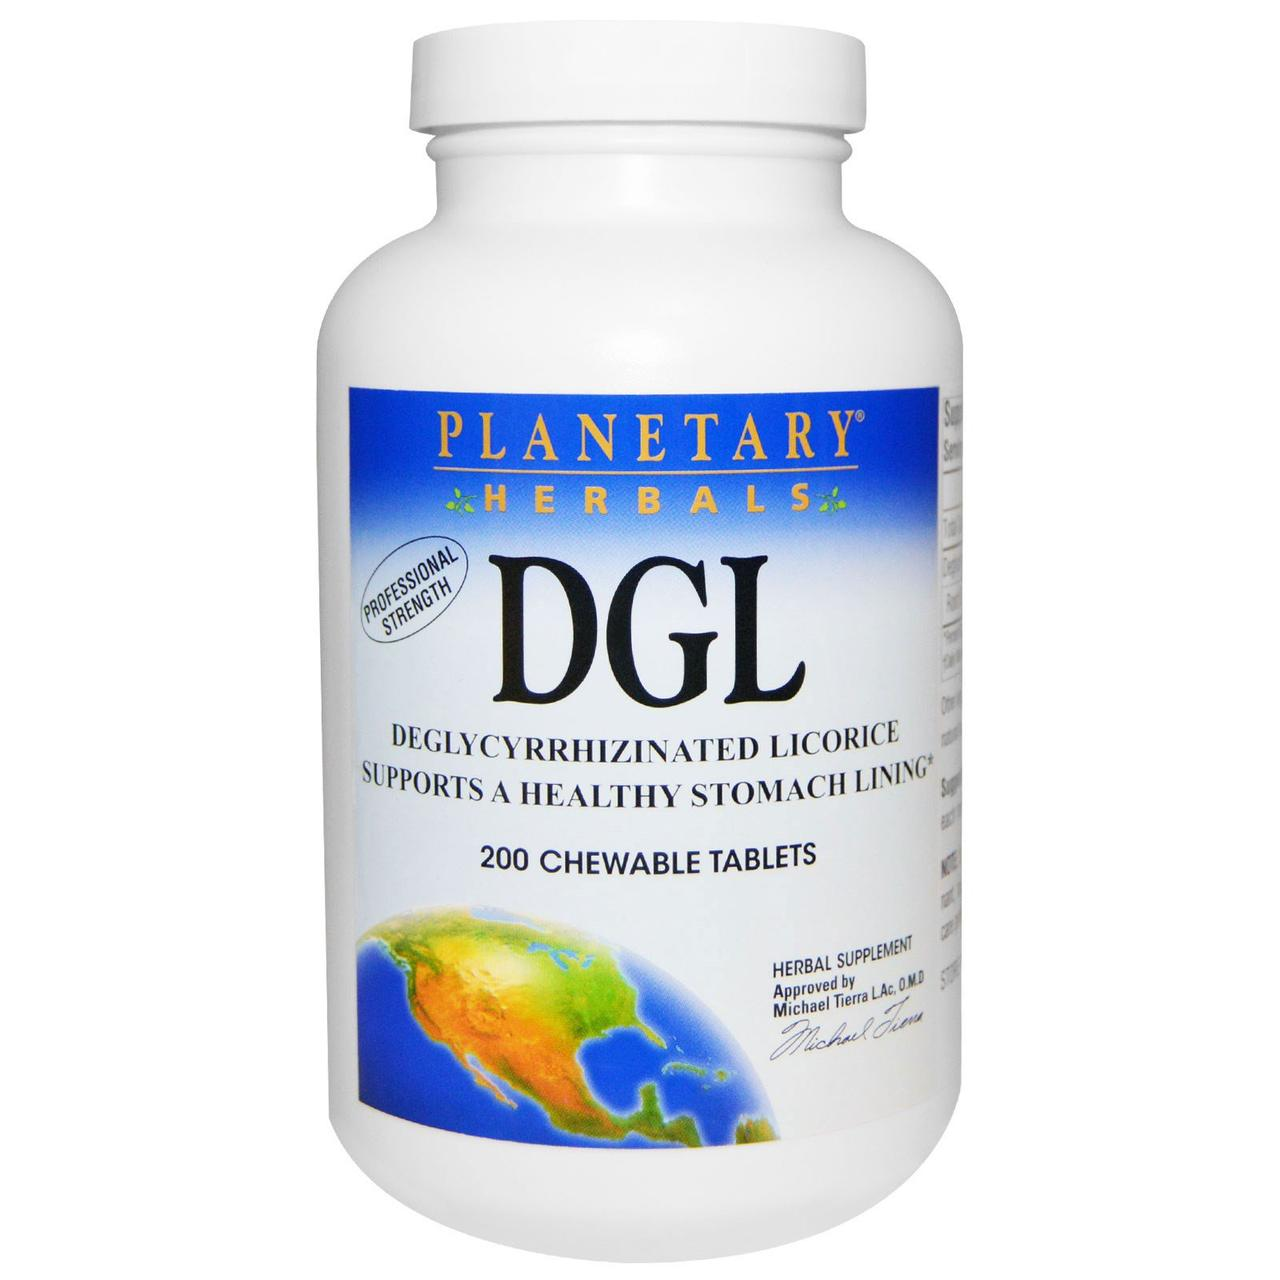 Корінь солодки (Deglycyrrhizinated Licorice), Planetary Herbals, 200 пігулок